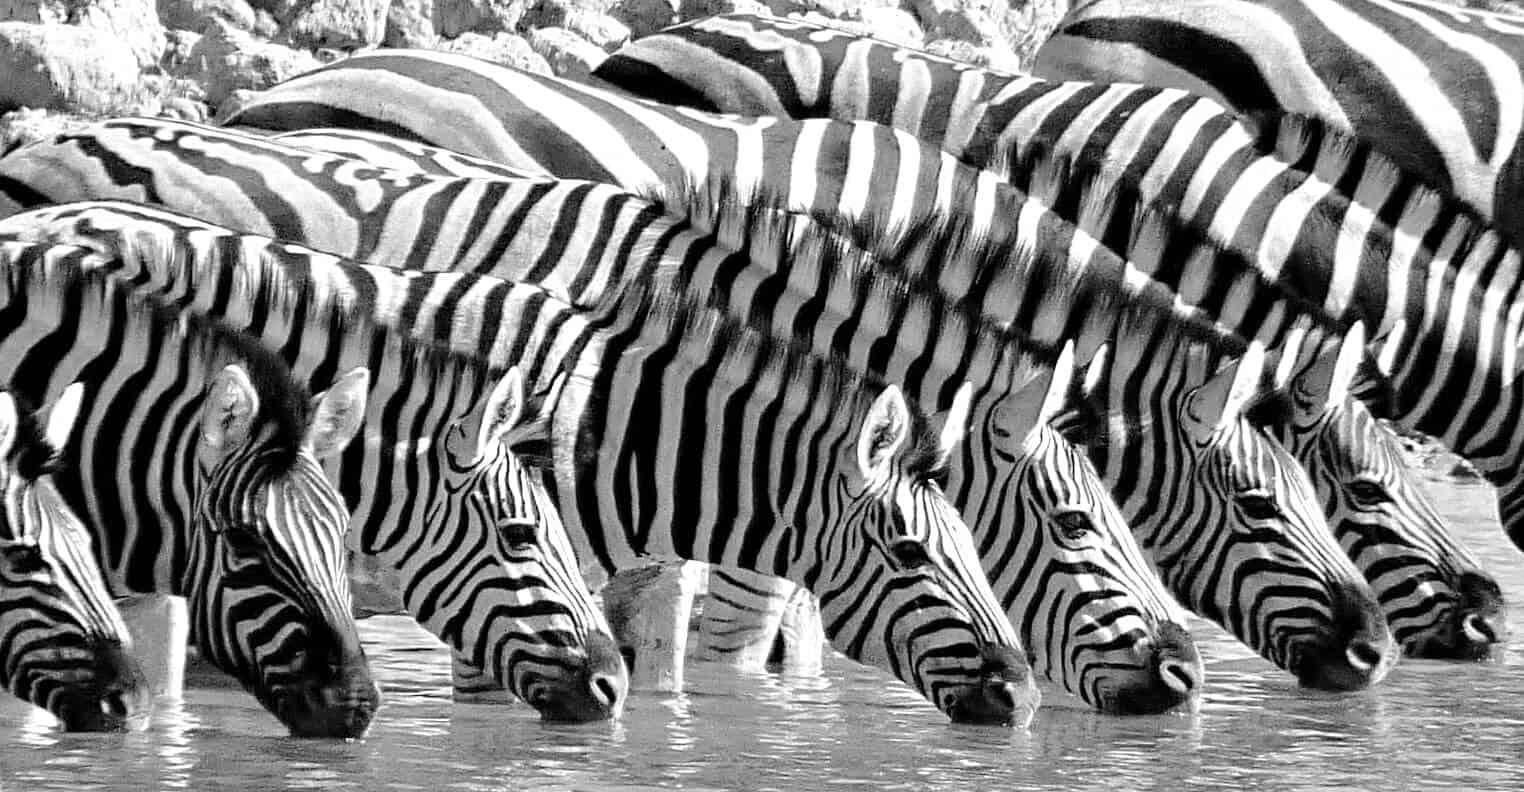 Zebras, Namibia